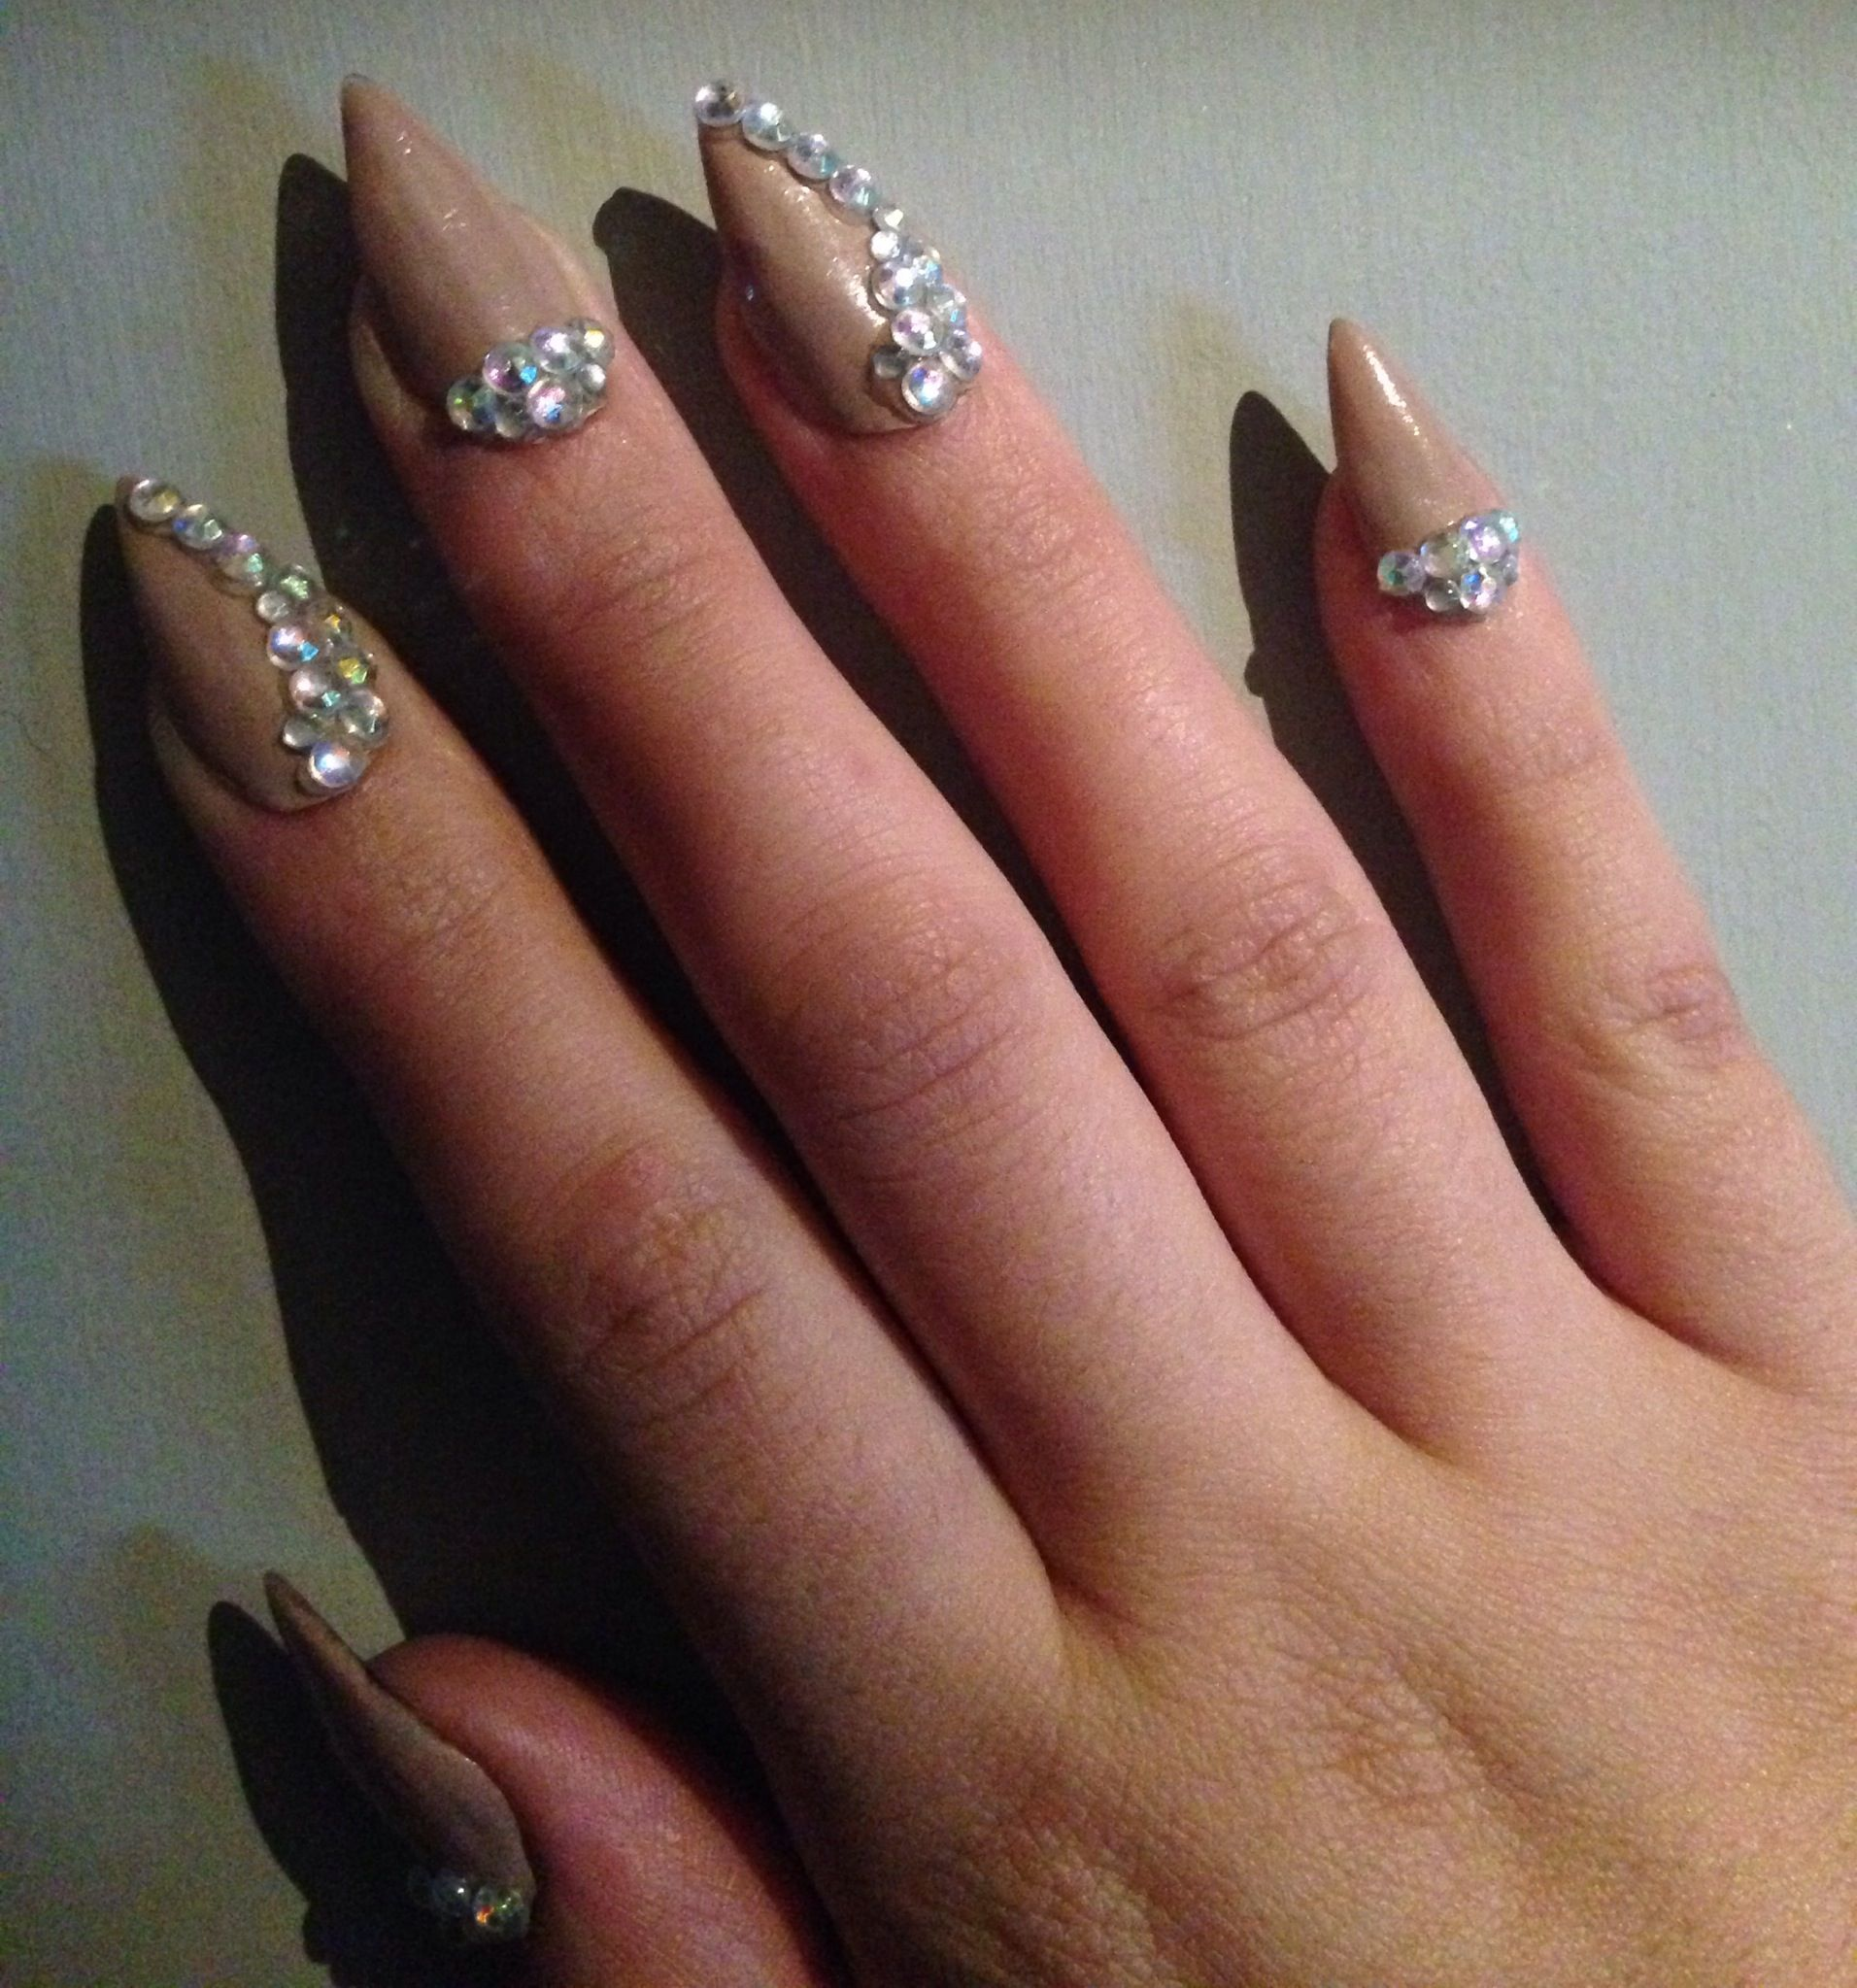 Nude rhinestones stiletto nails. | Nail designs | Pinterest | Bling ...